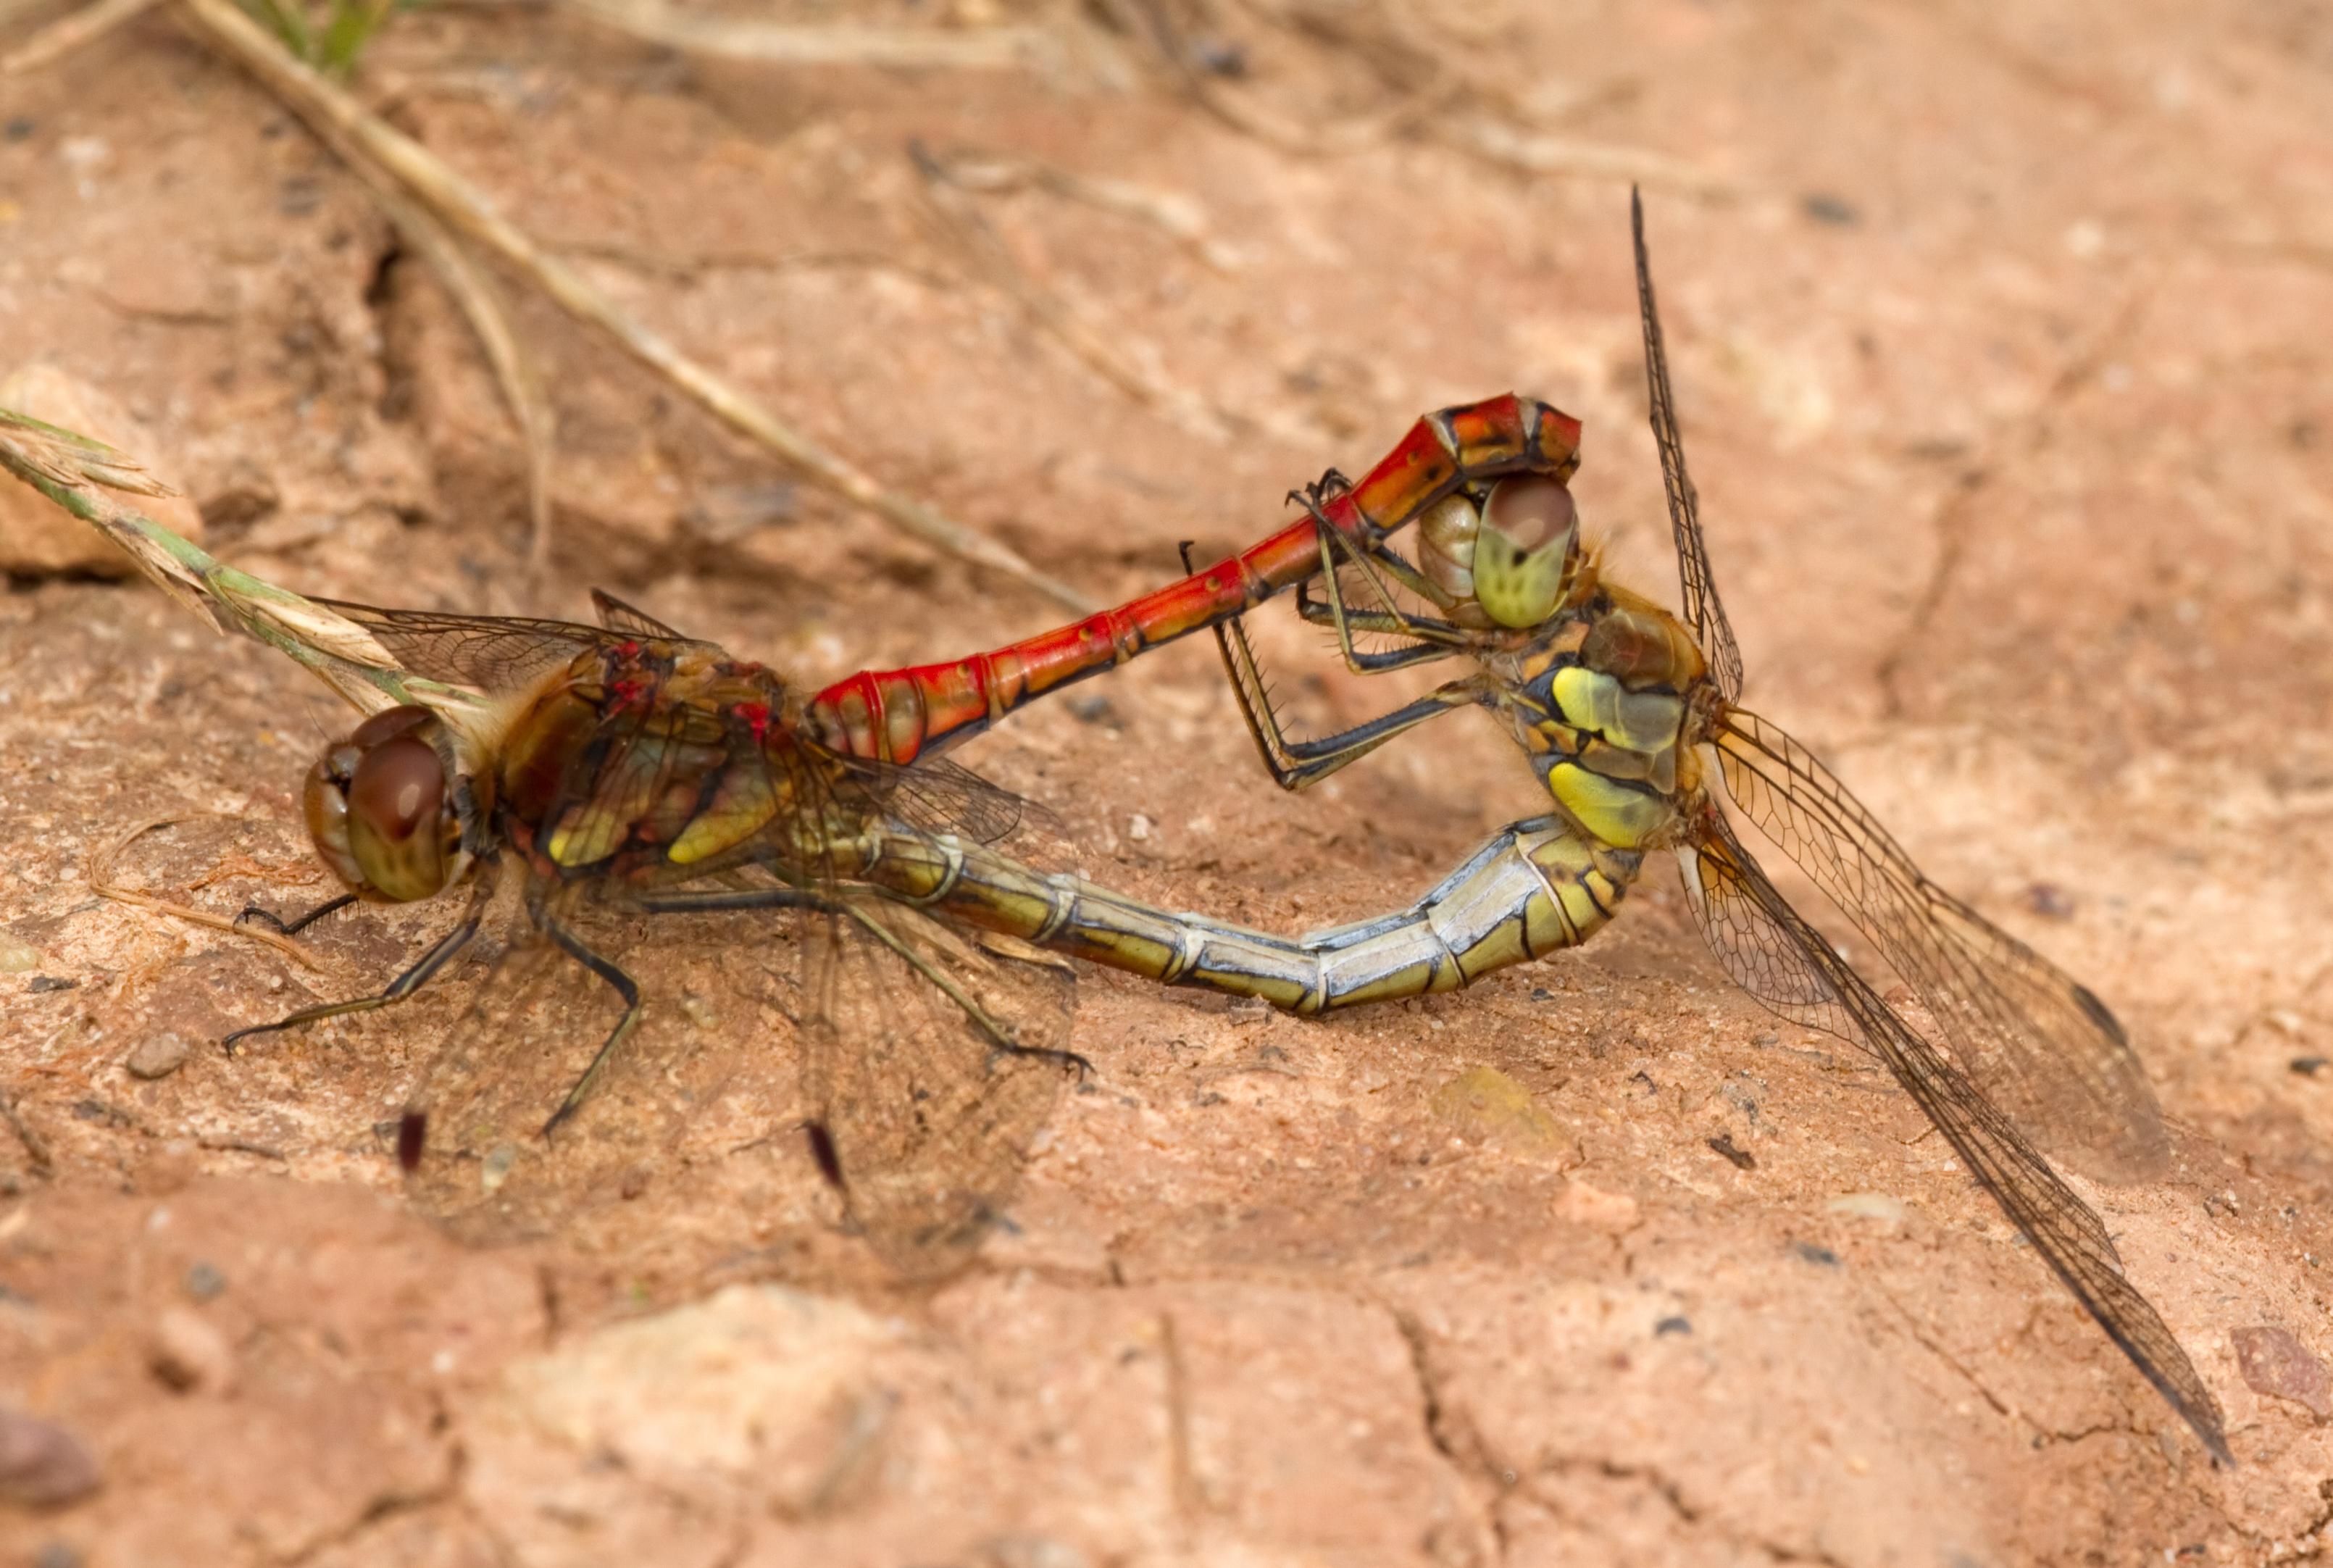 File:Darters Mating 2 (6129784595).jpg - Wikimedia Commons